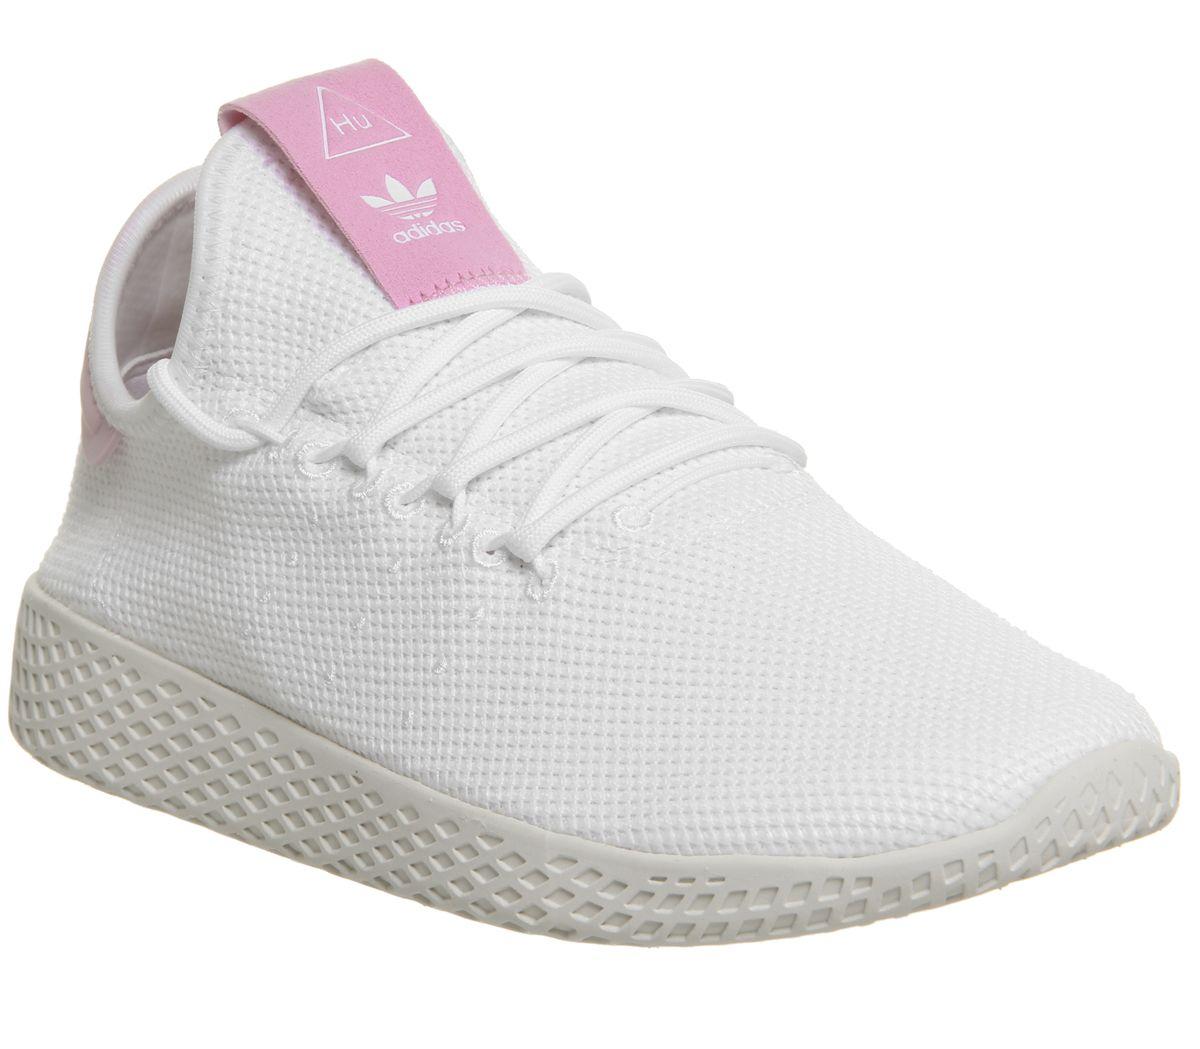 334216774c9ea adidas Pw Tennis Hu White White Pink F - Hers trainers